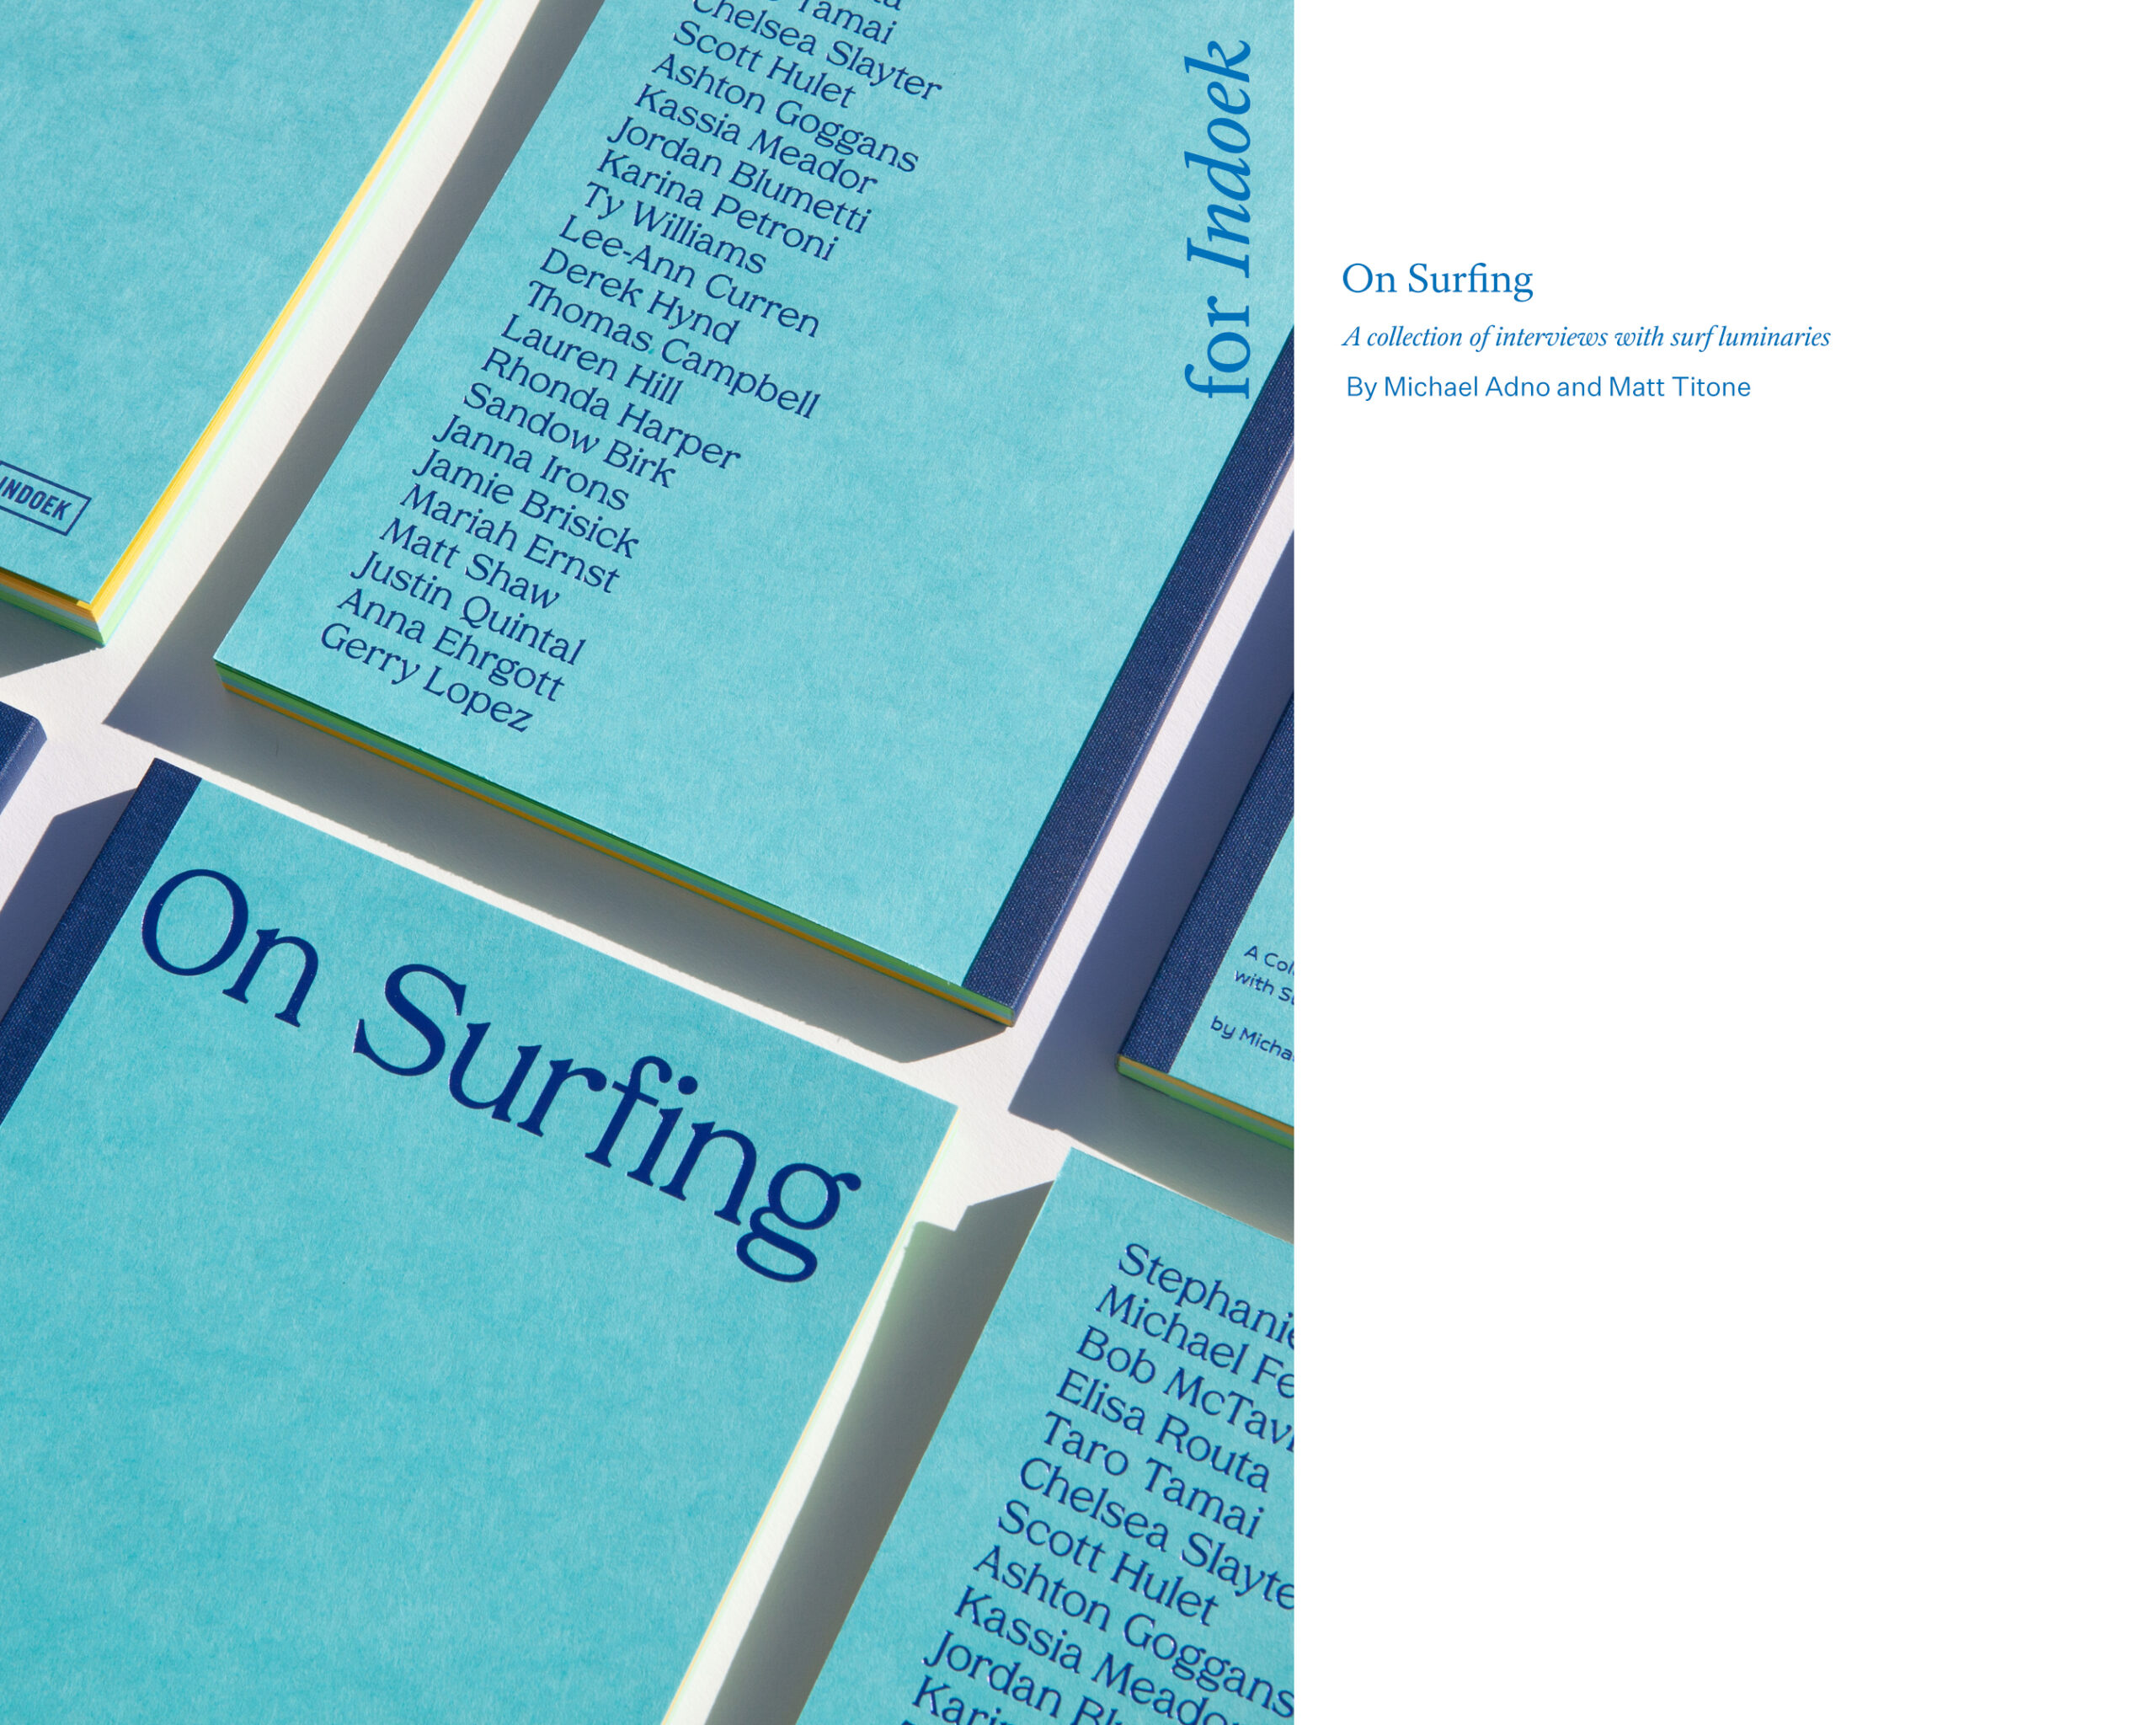 On-Surfing